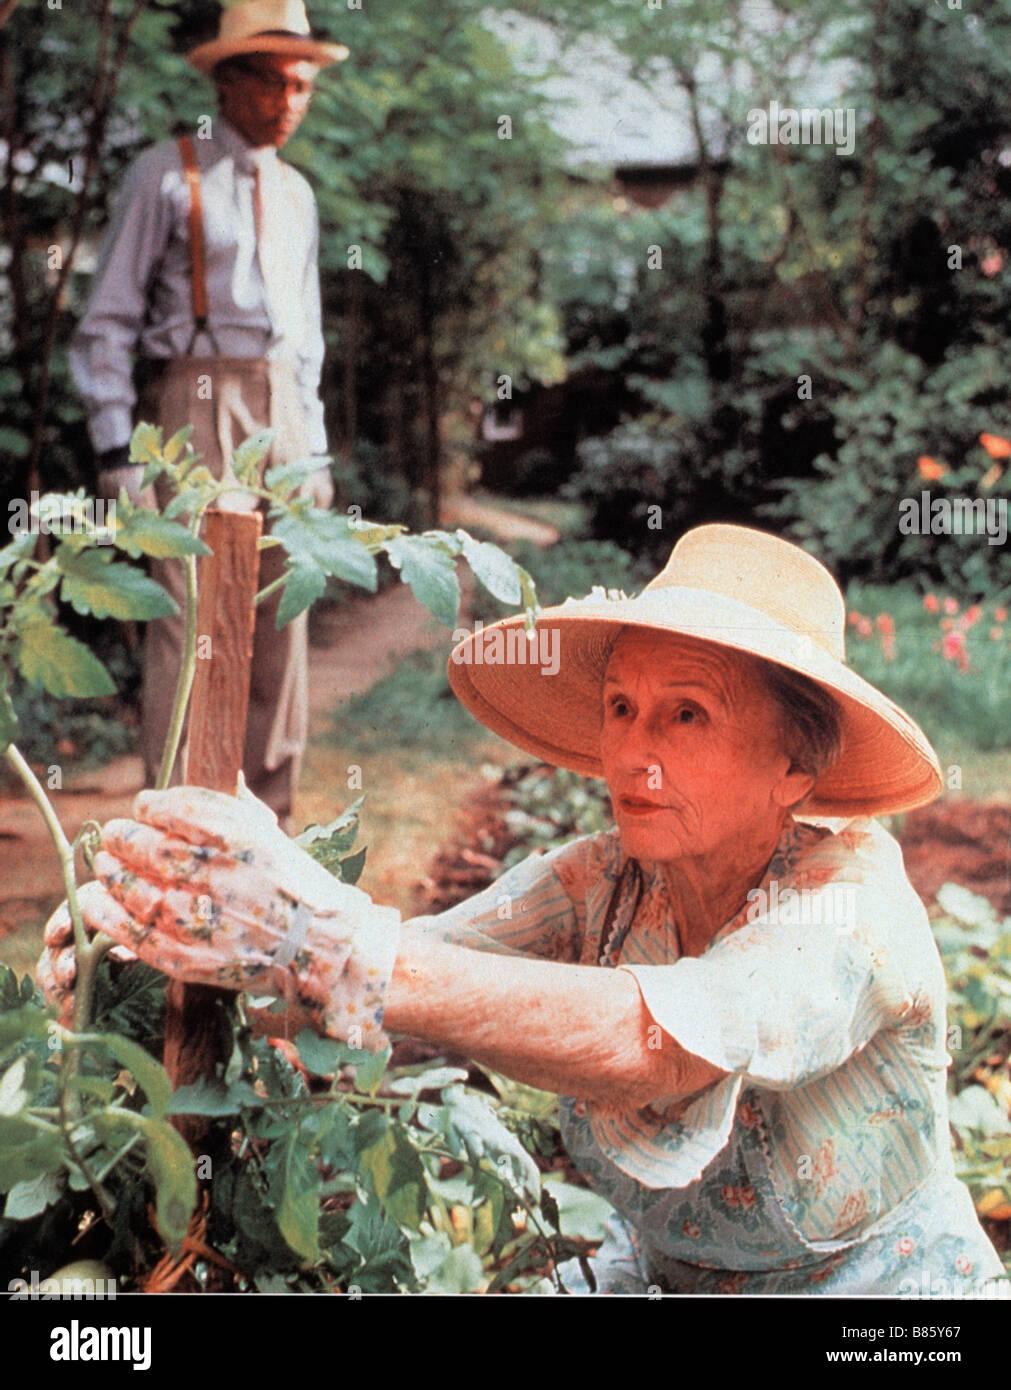 June Lockhart images